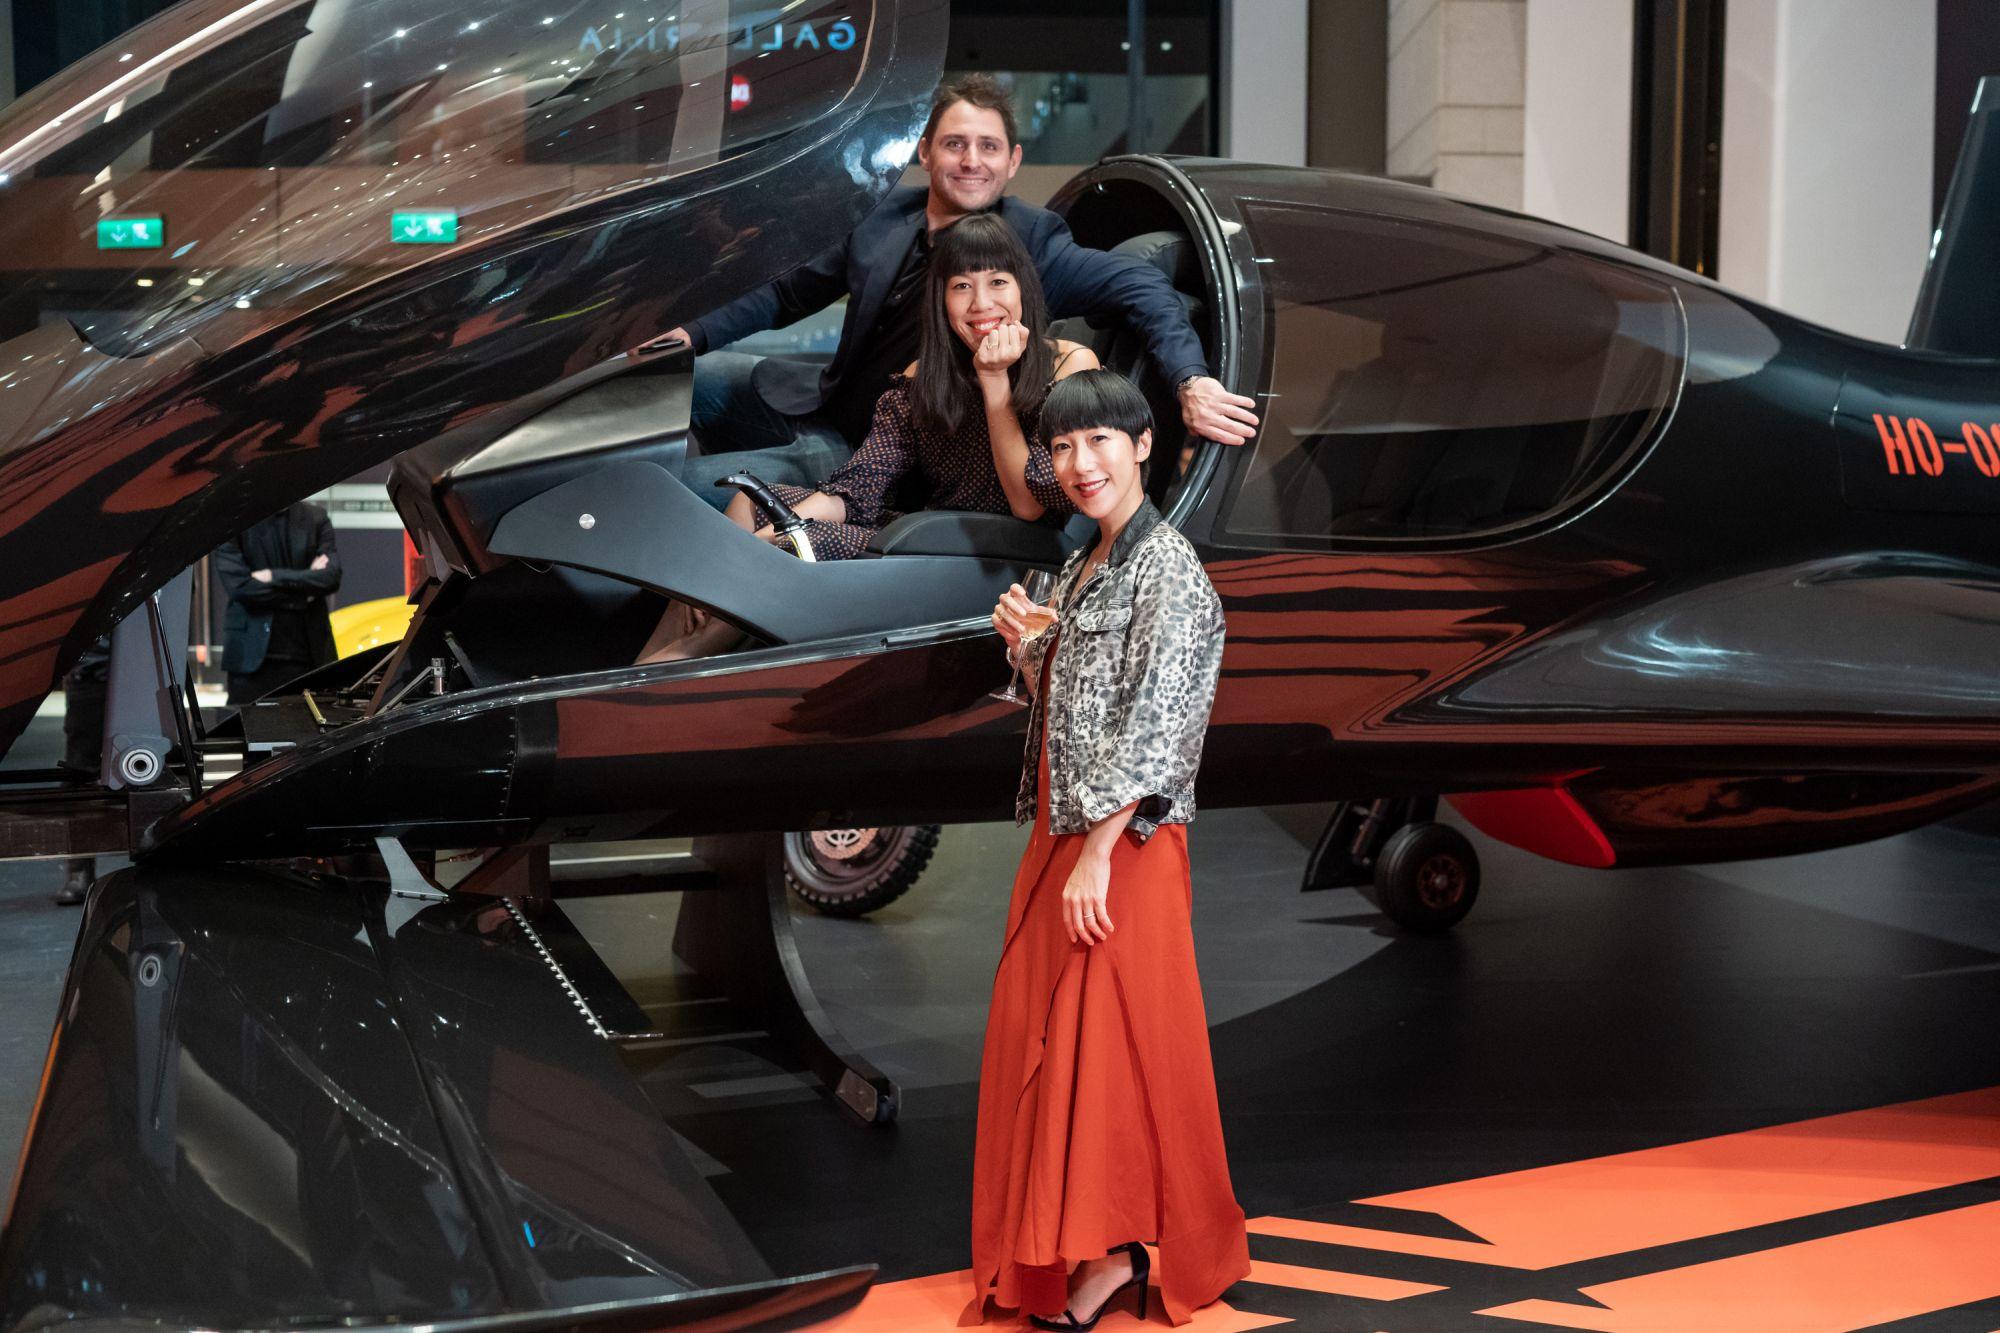 Thierry Mandonnaud, Ingrid Chen-Mandonnaud, Denise Ho